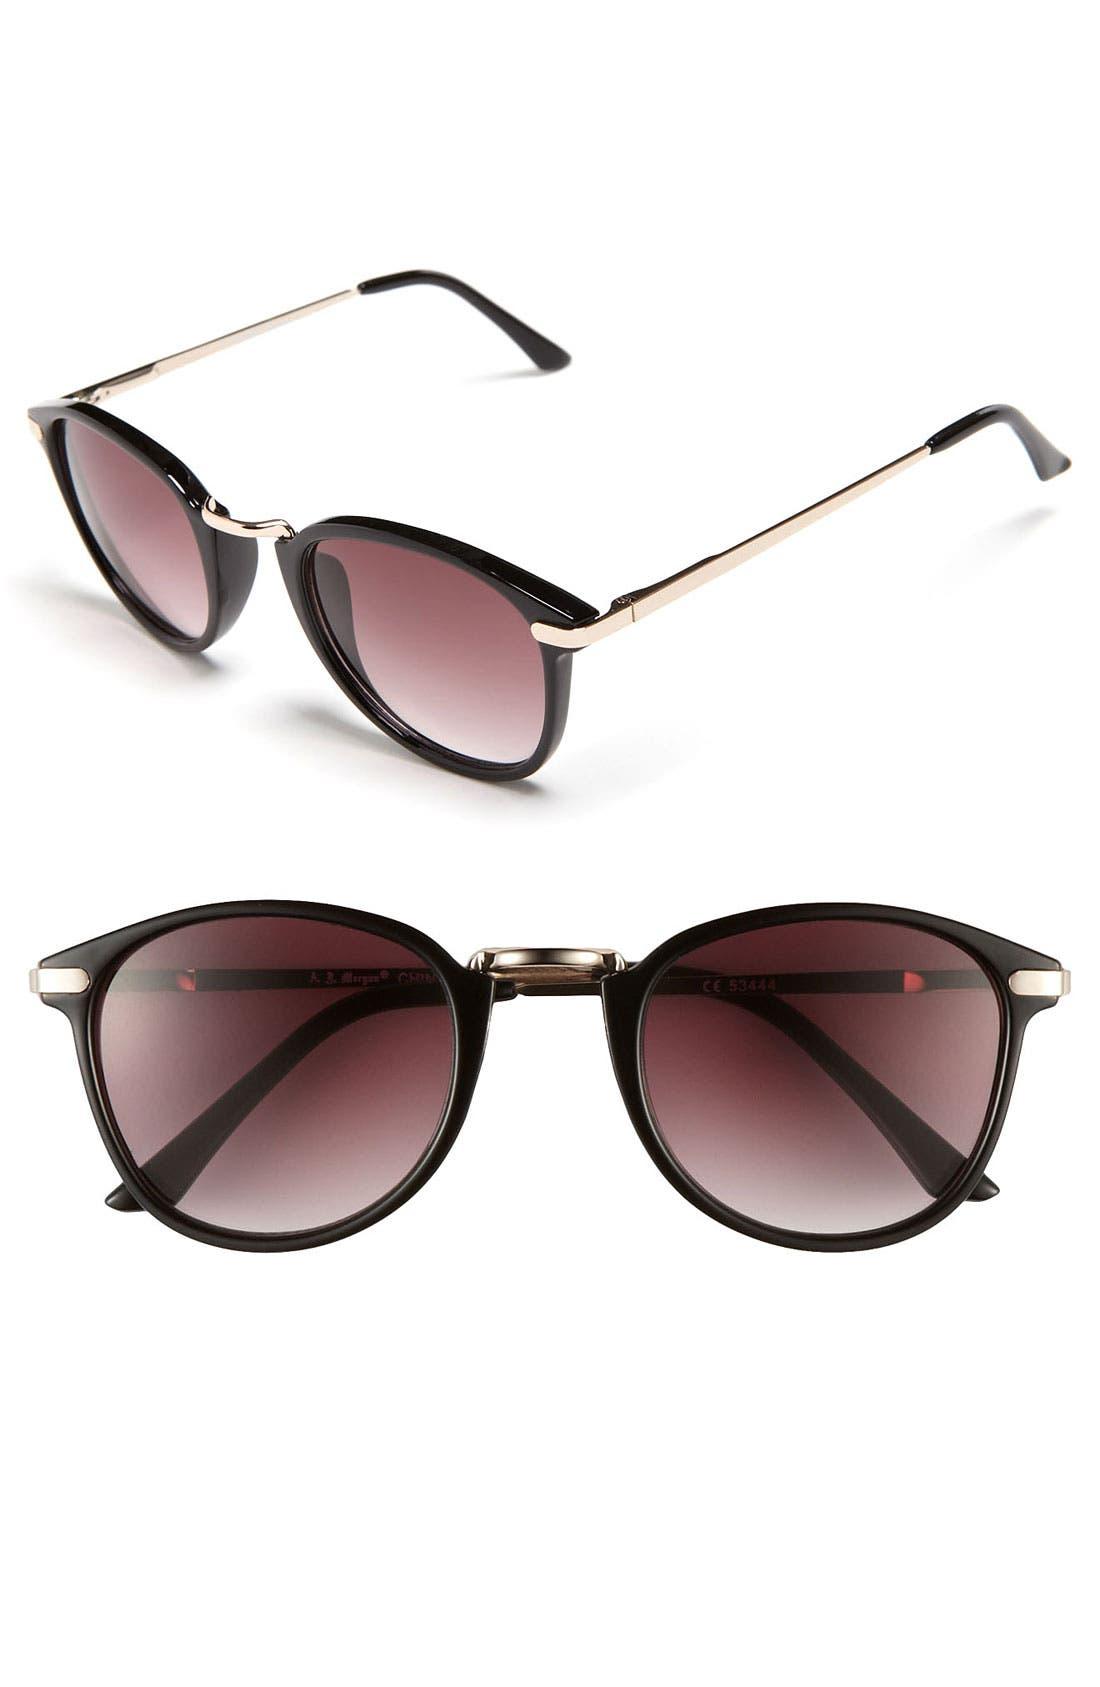 Main Image - A.J. Morgan 48mm 'Castro' Sunglasses